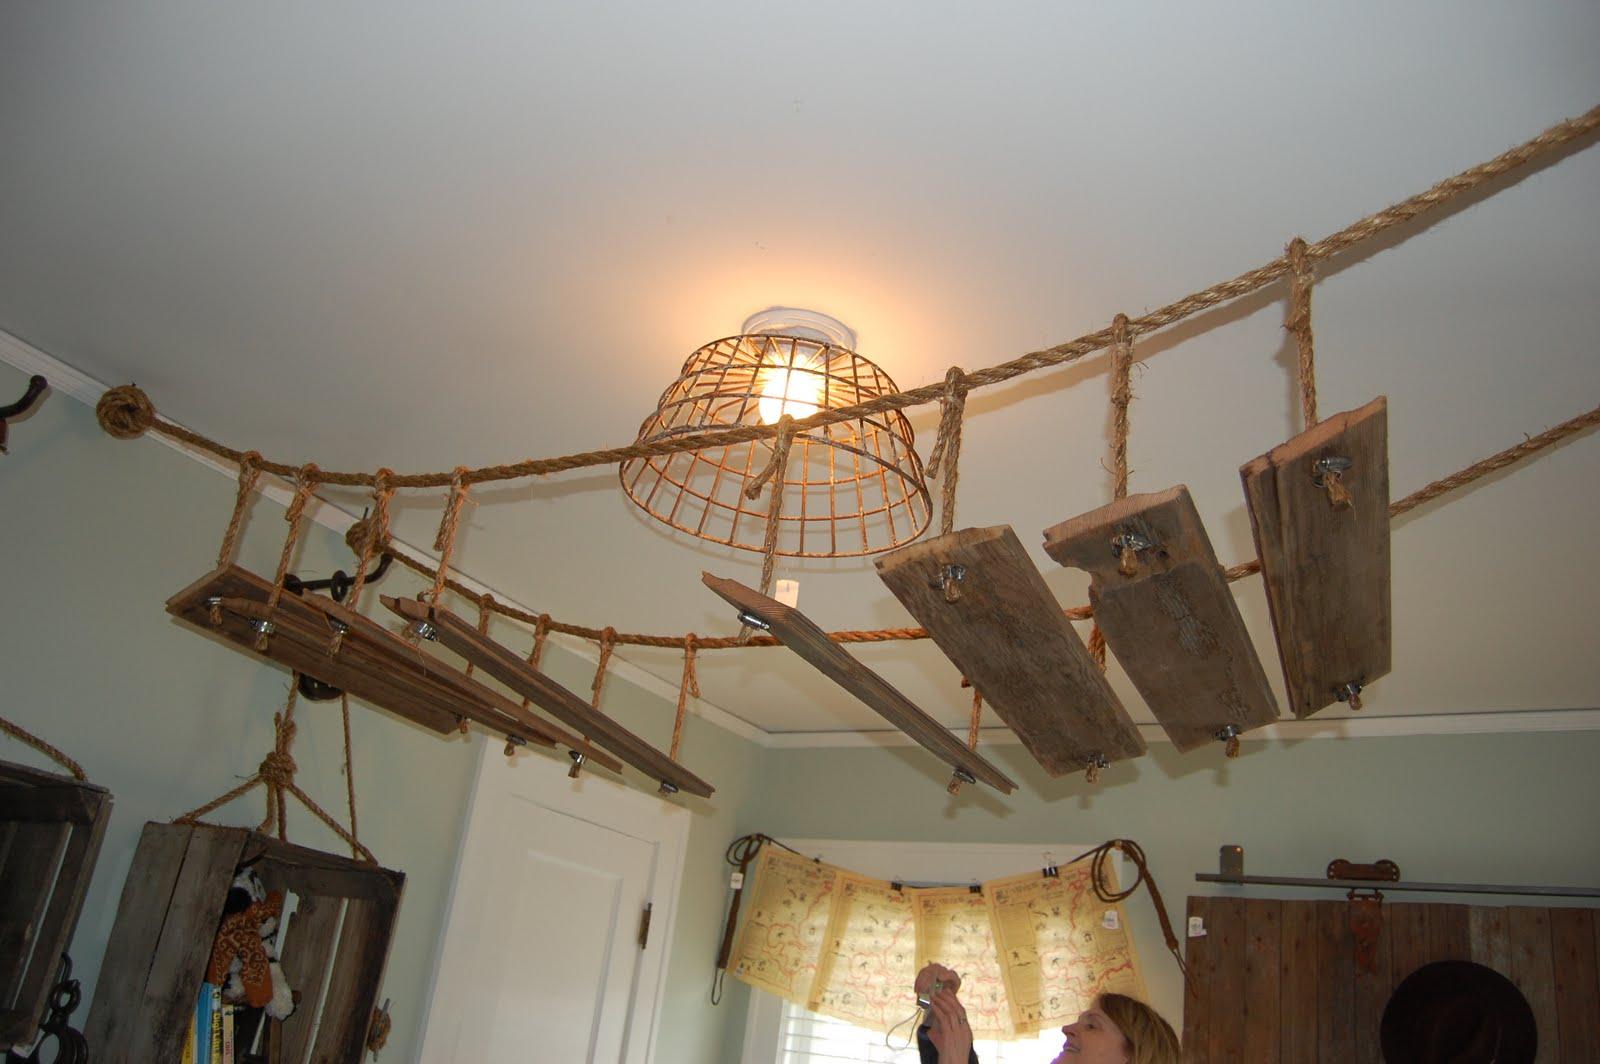 http://3.bp.blogspot.com/-tTiI24RaJbo/TanyNq8fPeI/AAAAAAAAC8I/lr3kfyqh7BY/s1600/Bachman%2527s+Spring+House+030.JPG